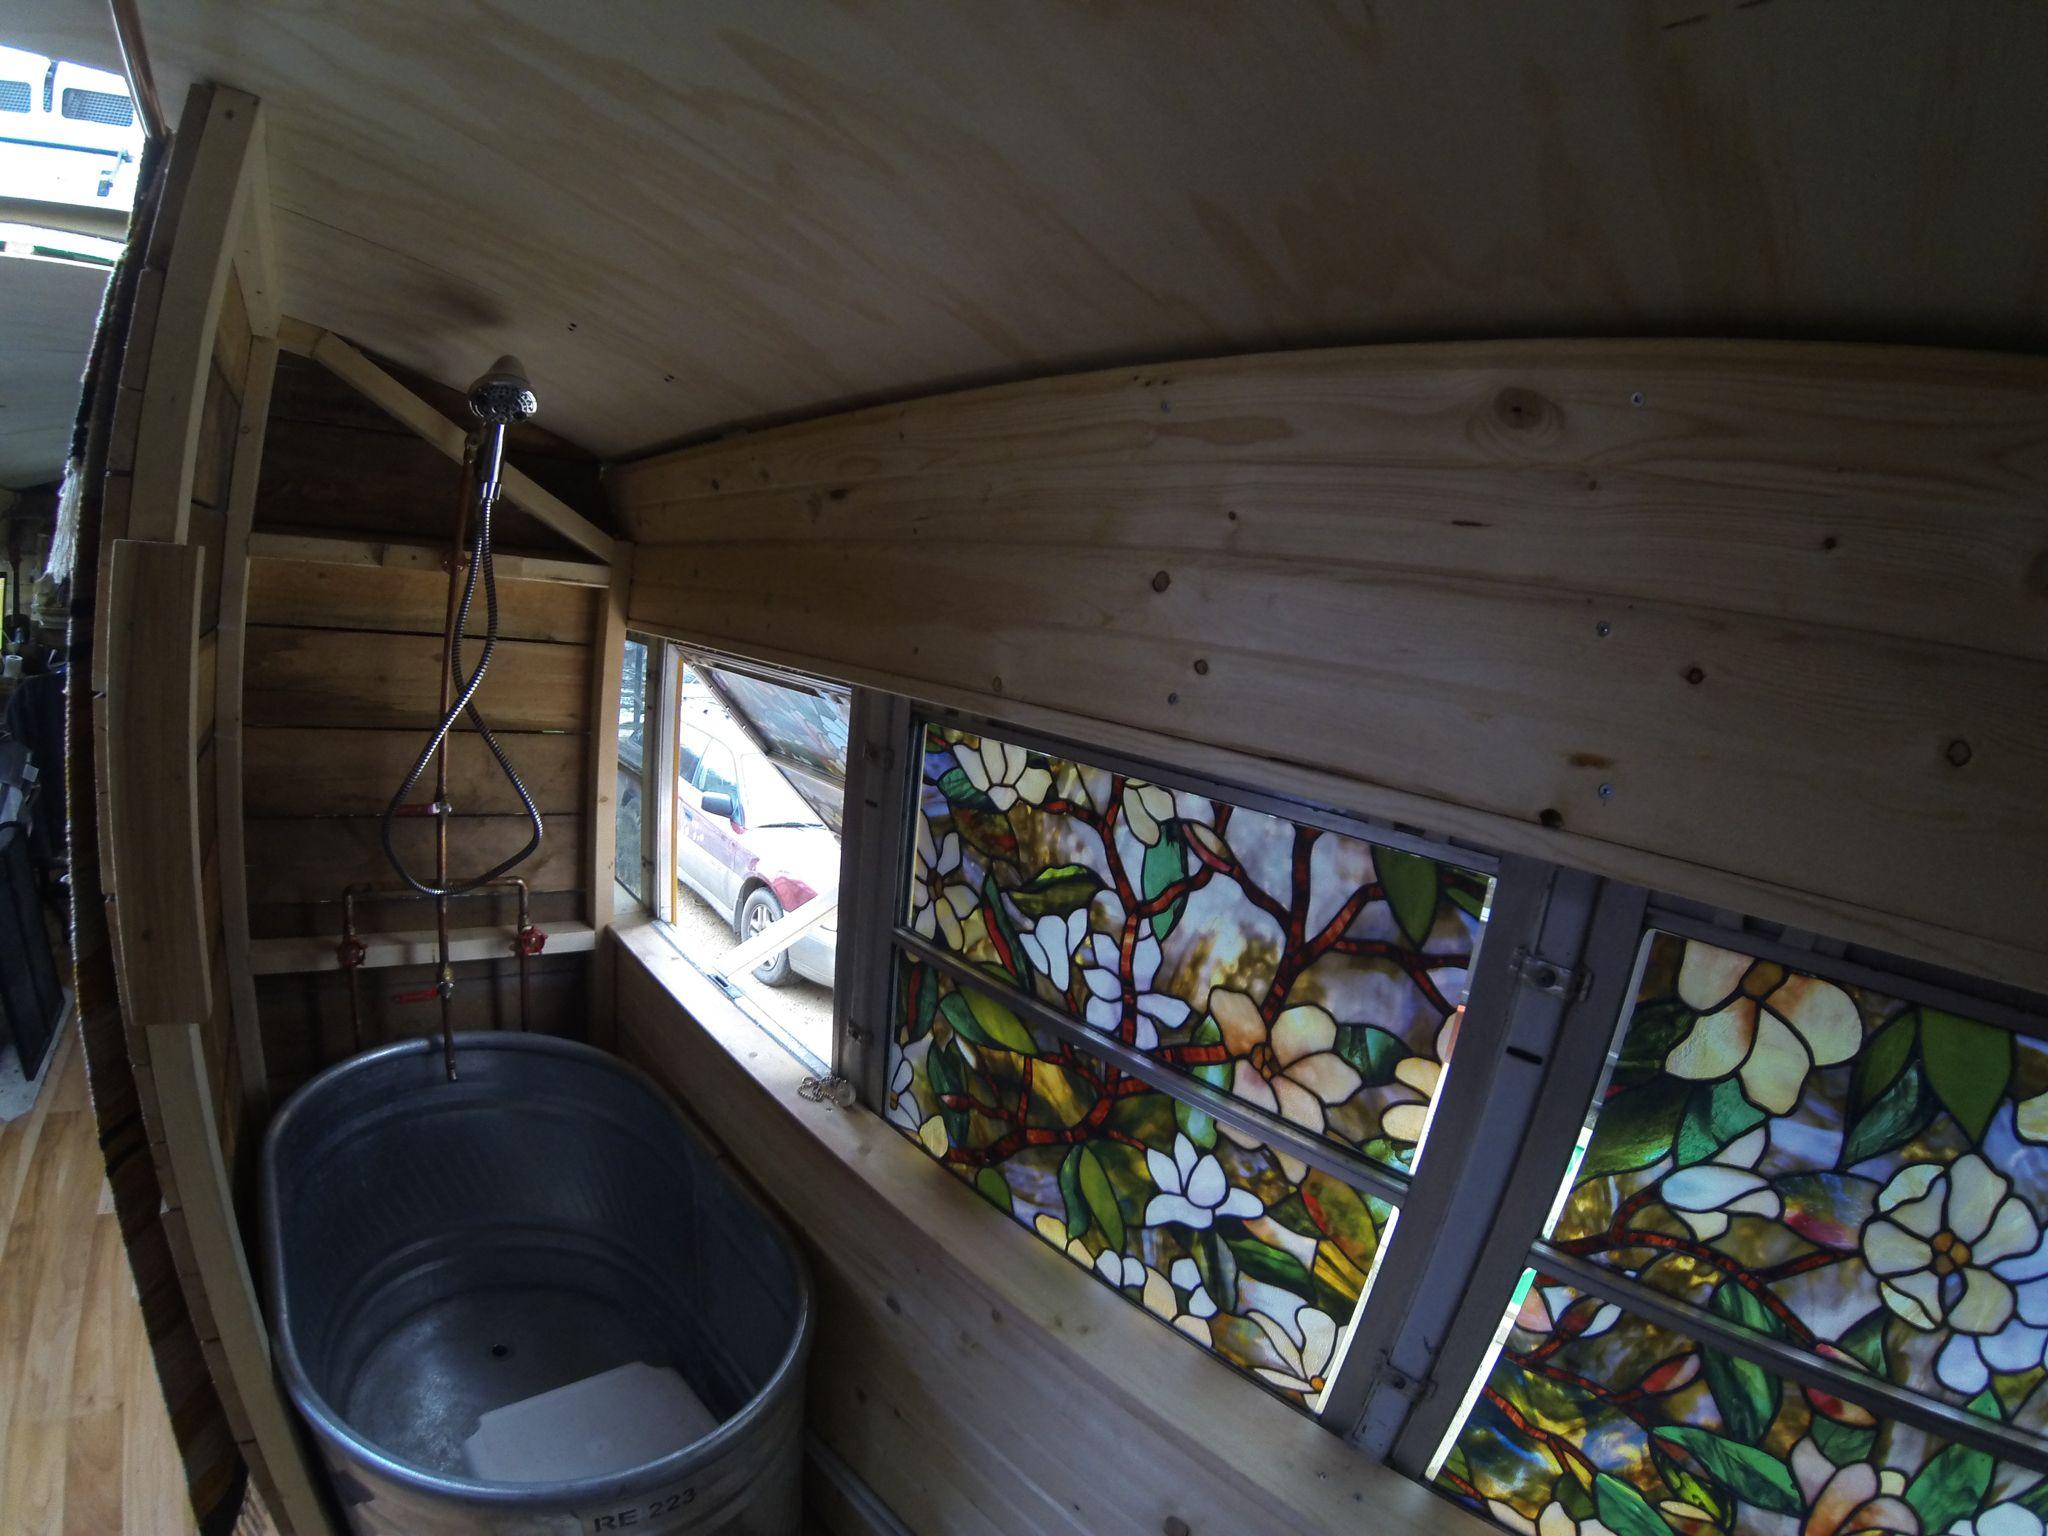 Bathroom Stock tank tub. Oxygenics shower head. Decals